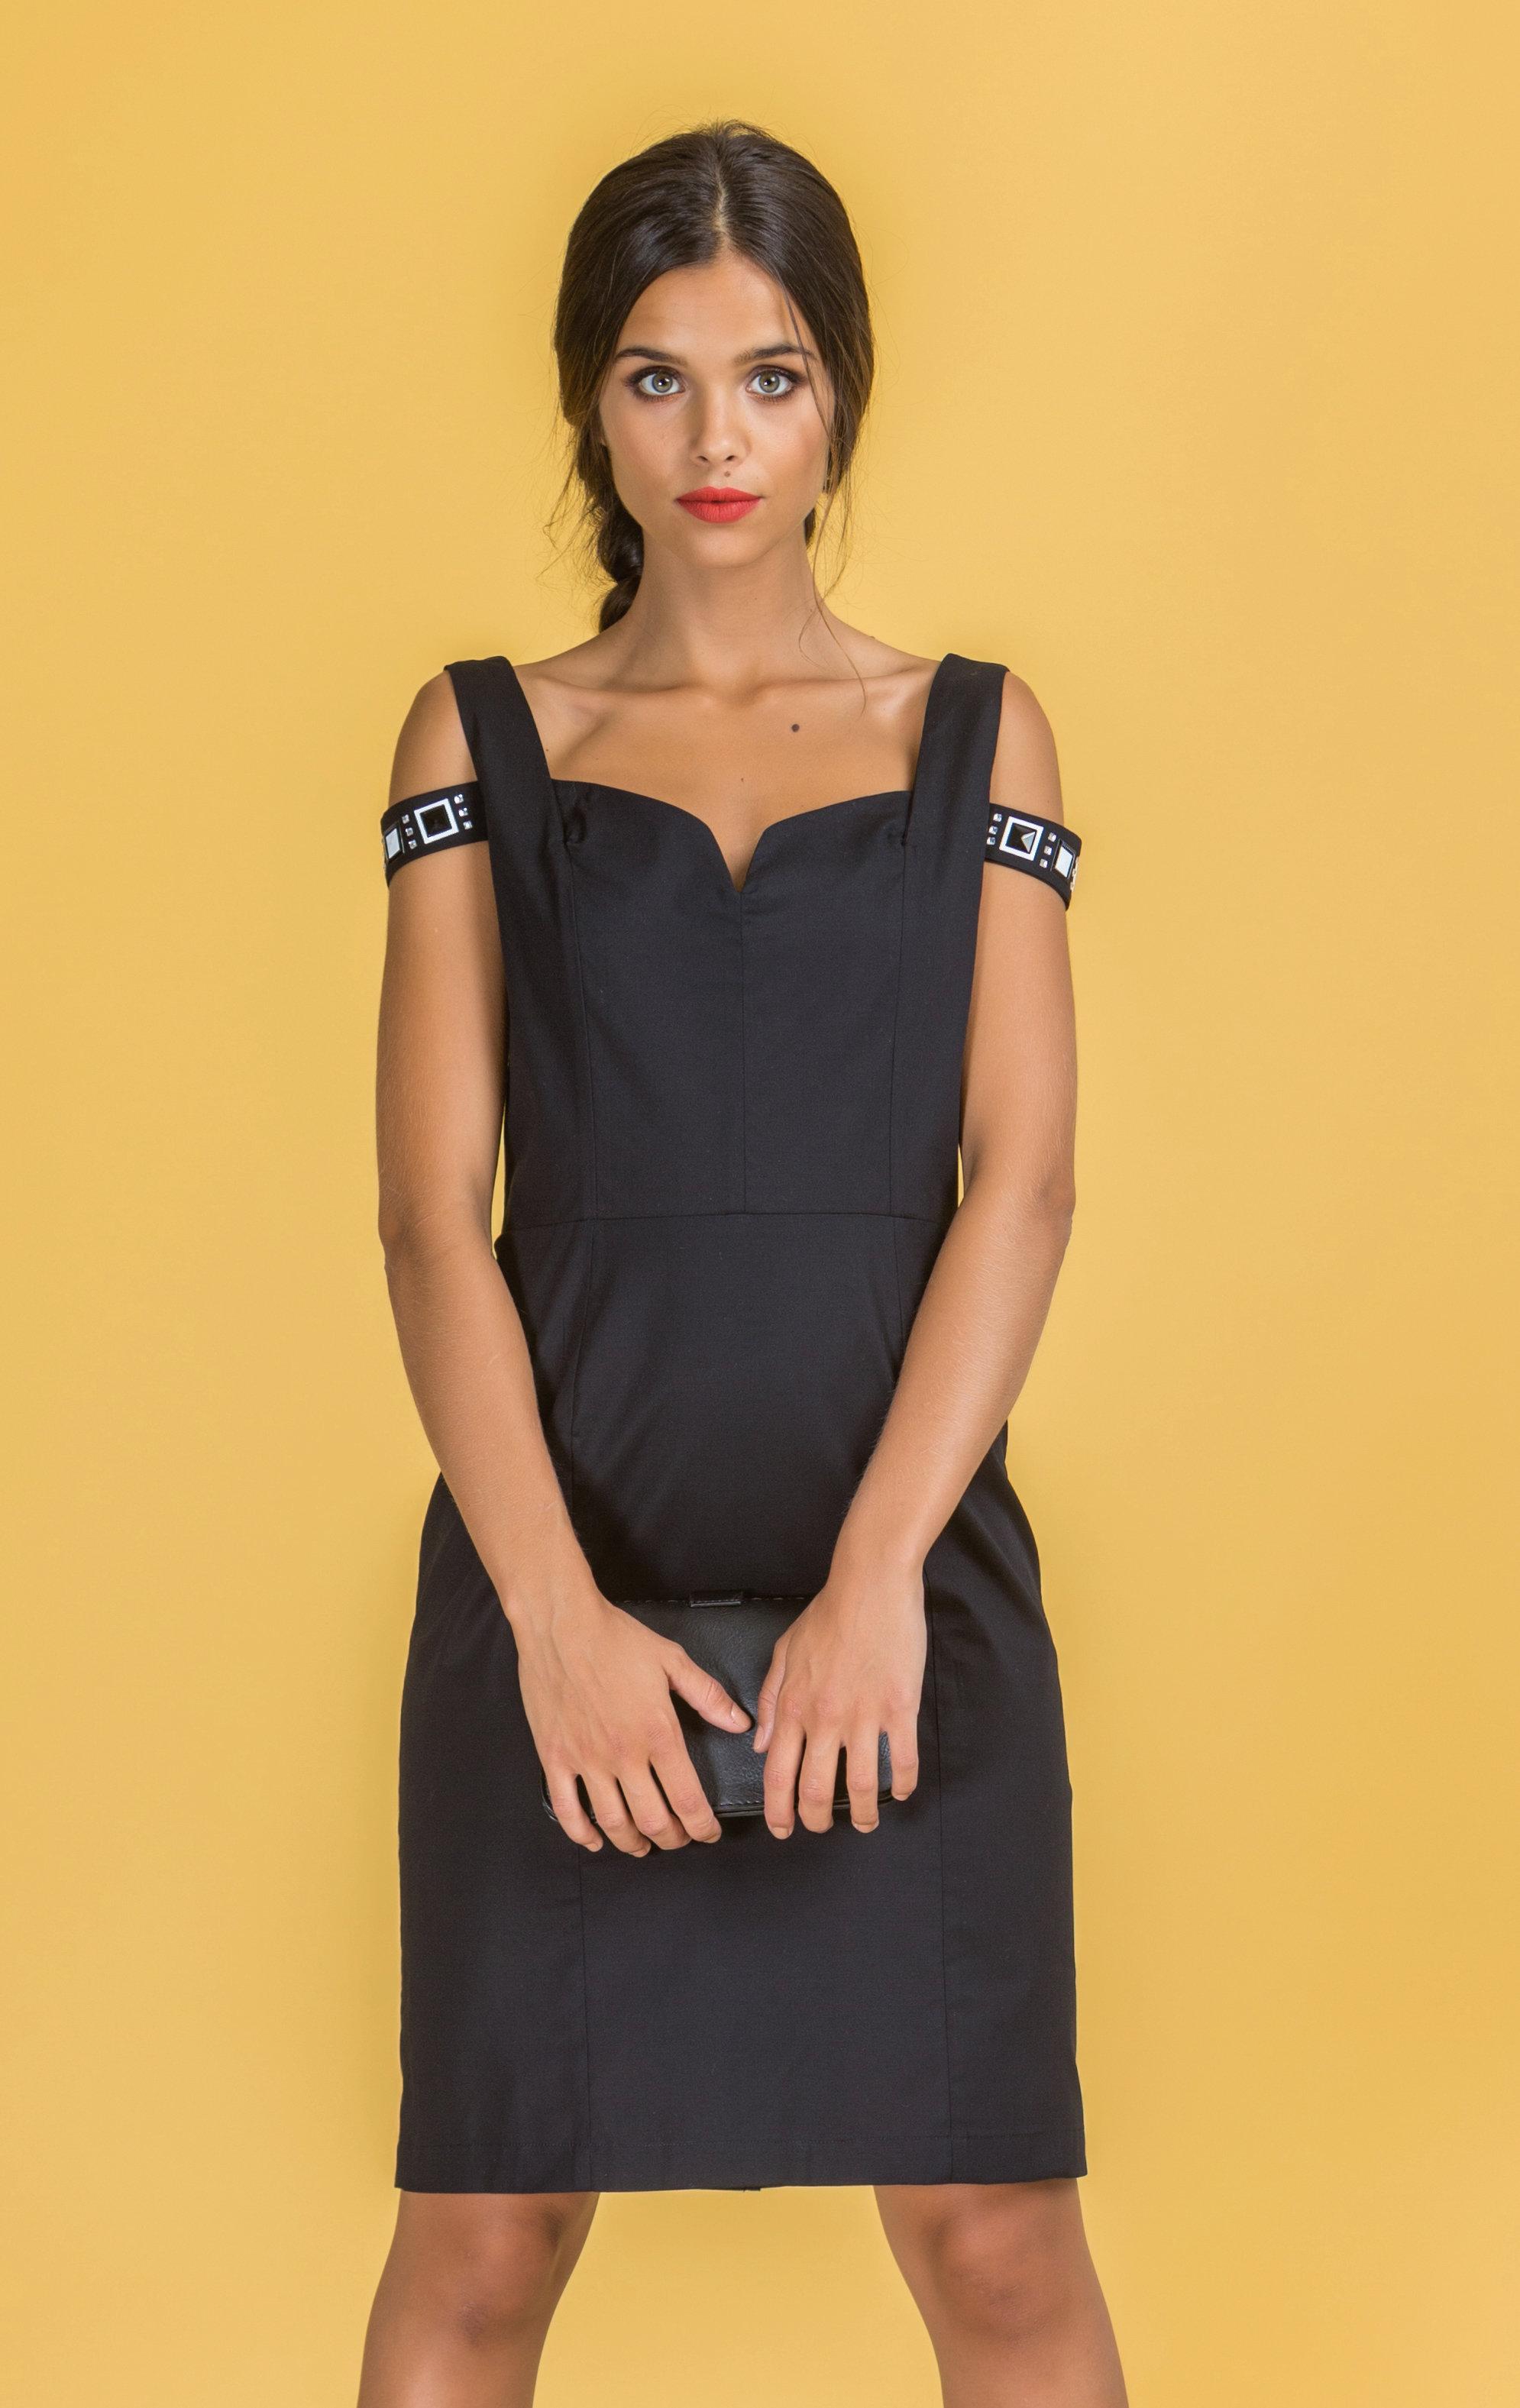 Paul Brial: Sweetheart Bodice Cut Out Shoulder Sexy Vixen Dress PB_MATHILDE